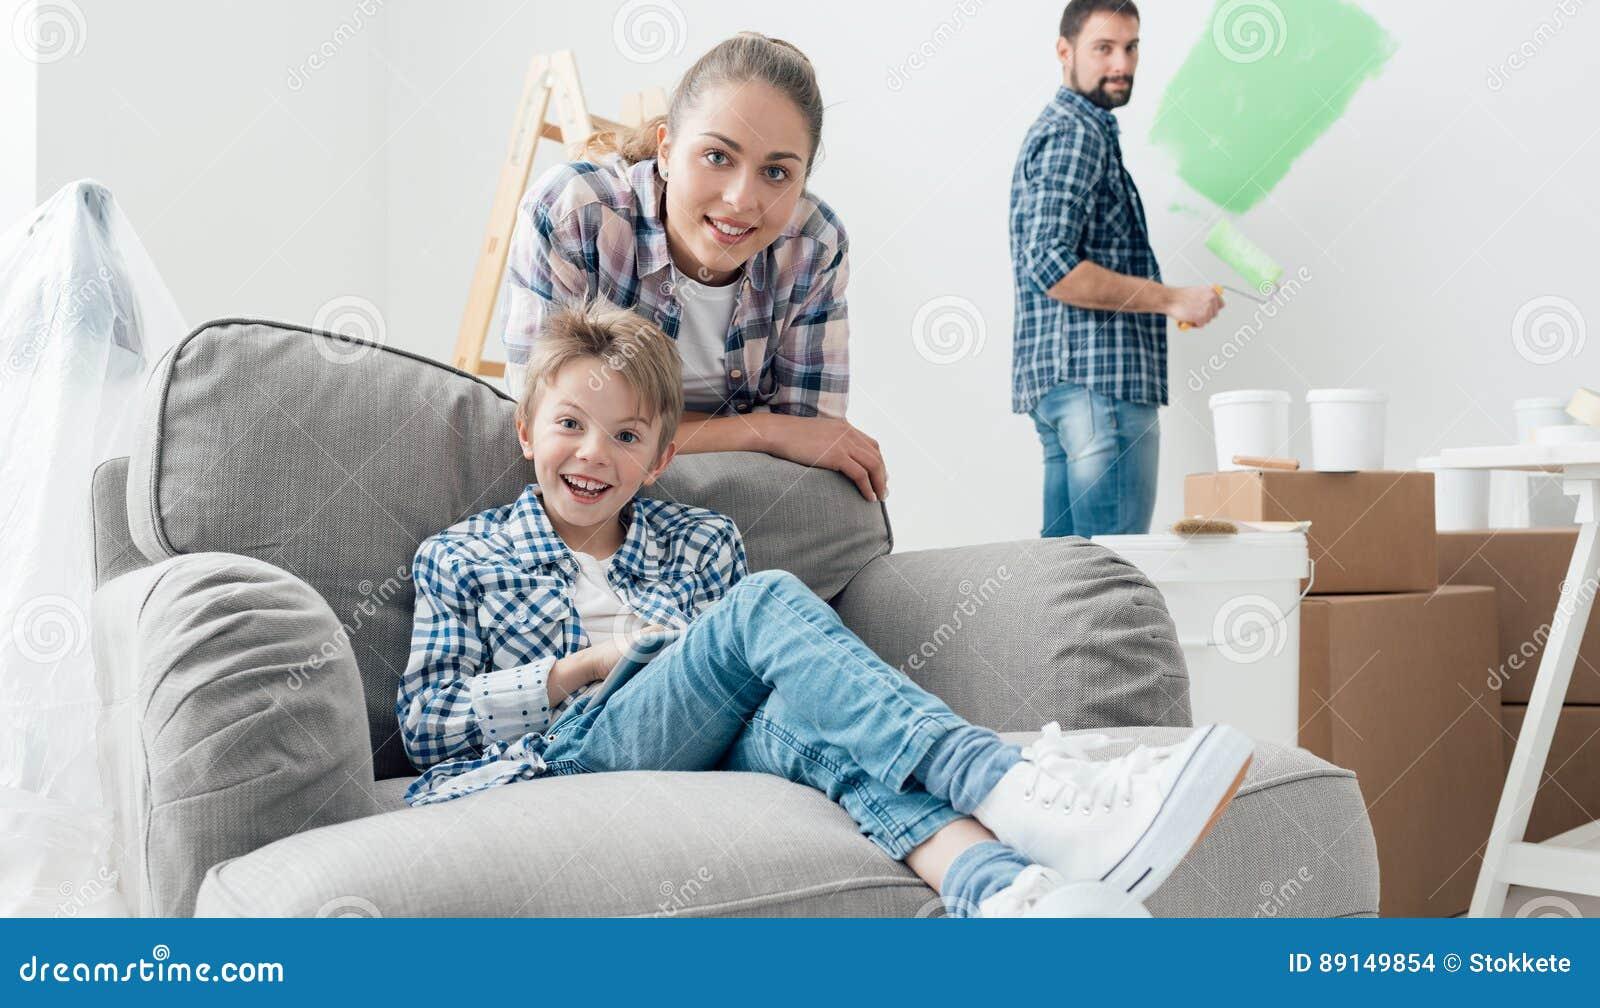 Family home renovation